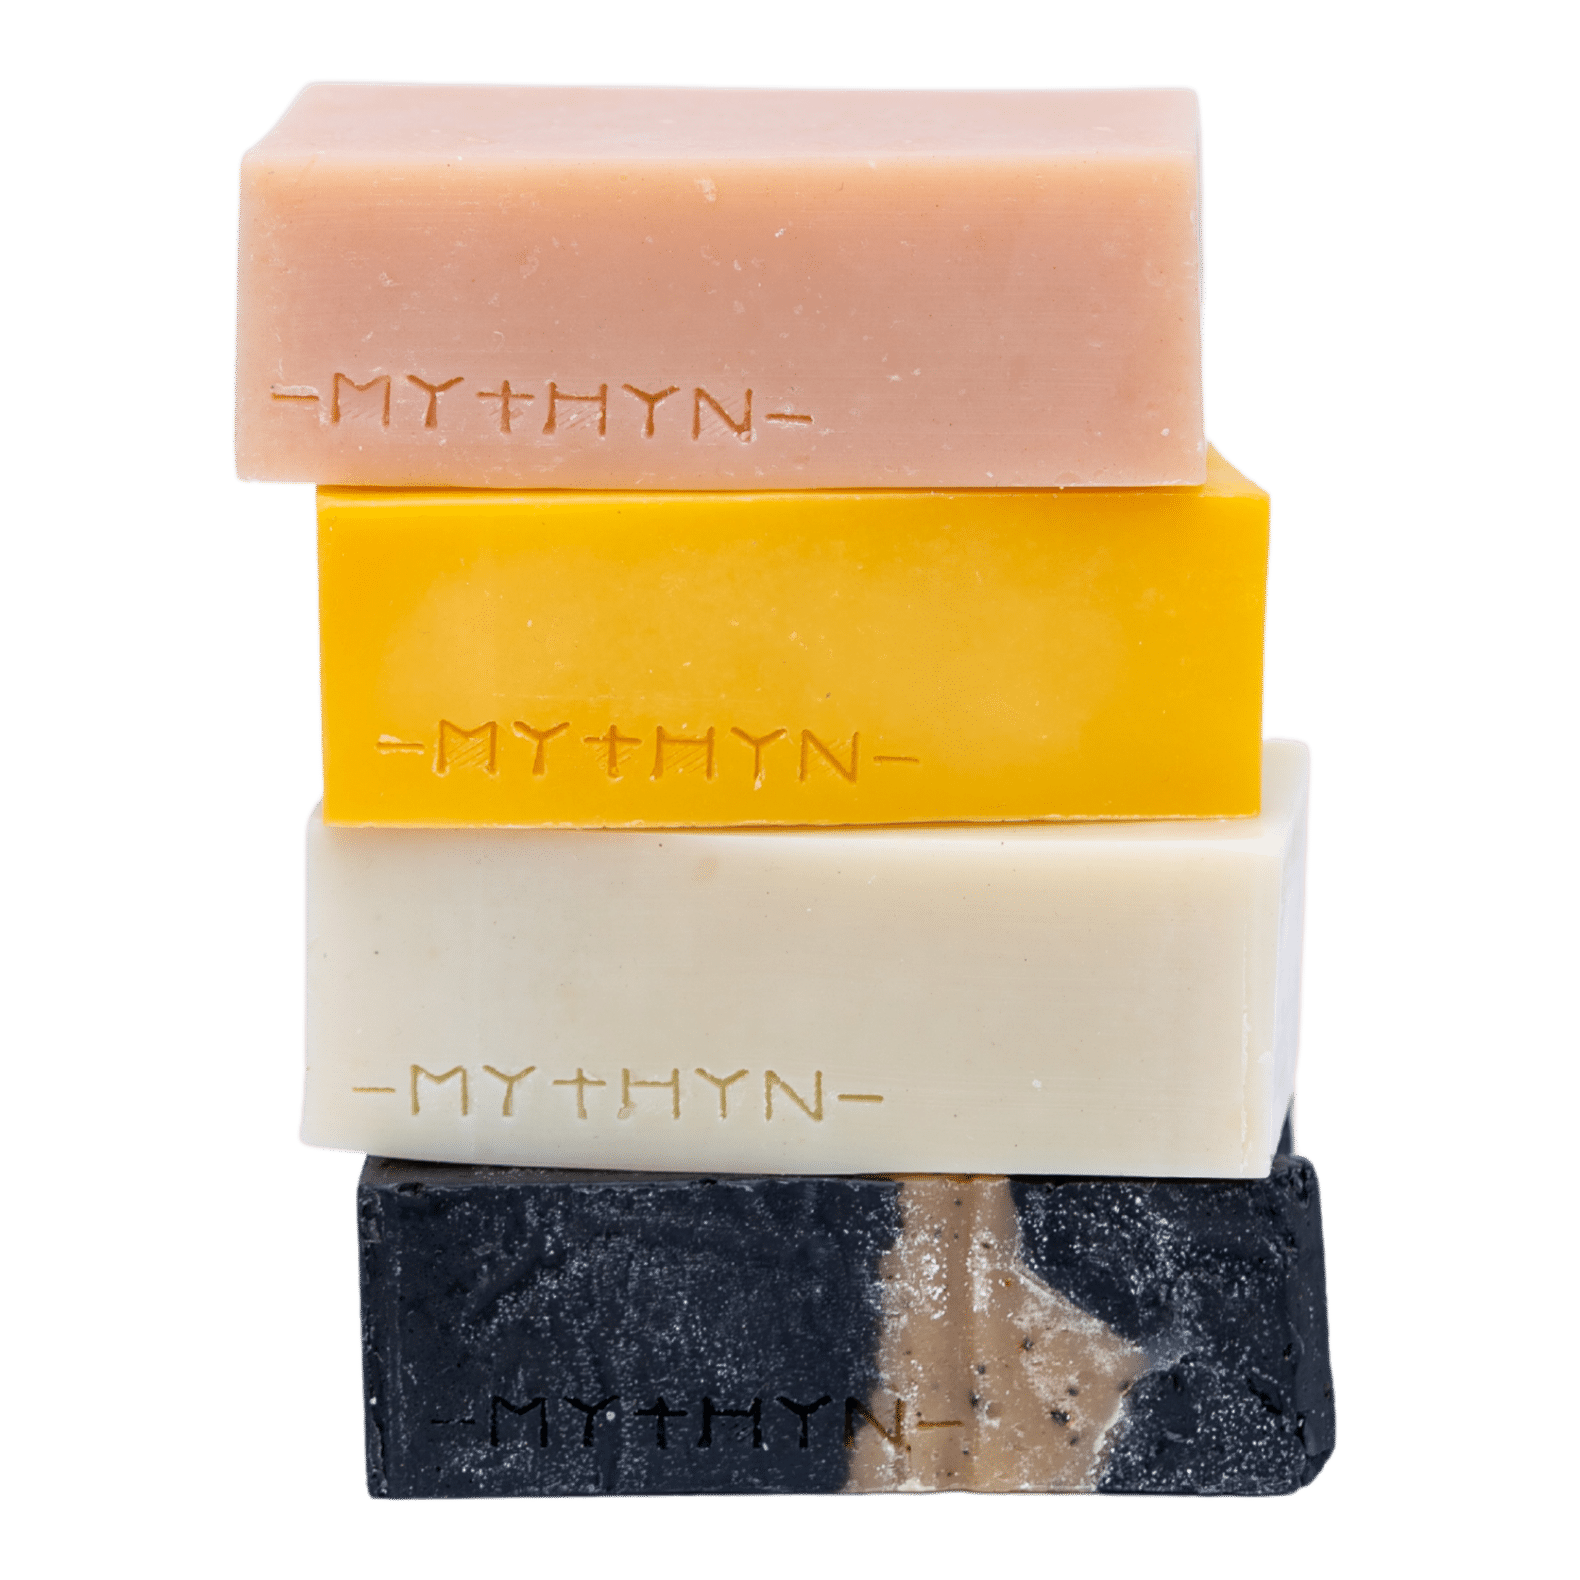 Mythyn - Natural Botanical Soap bars